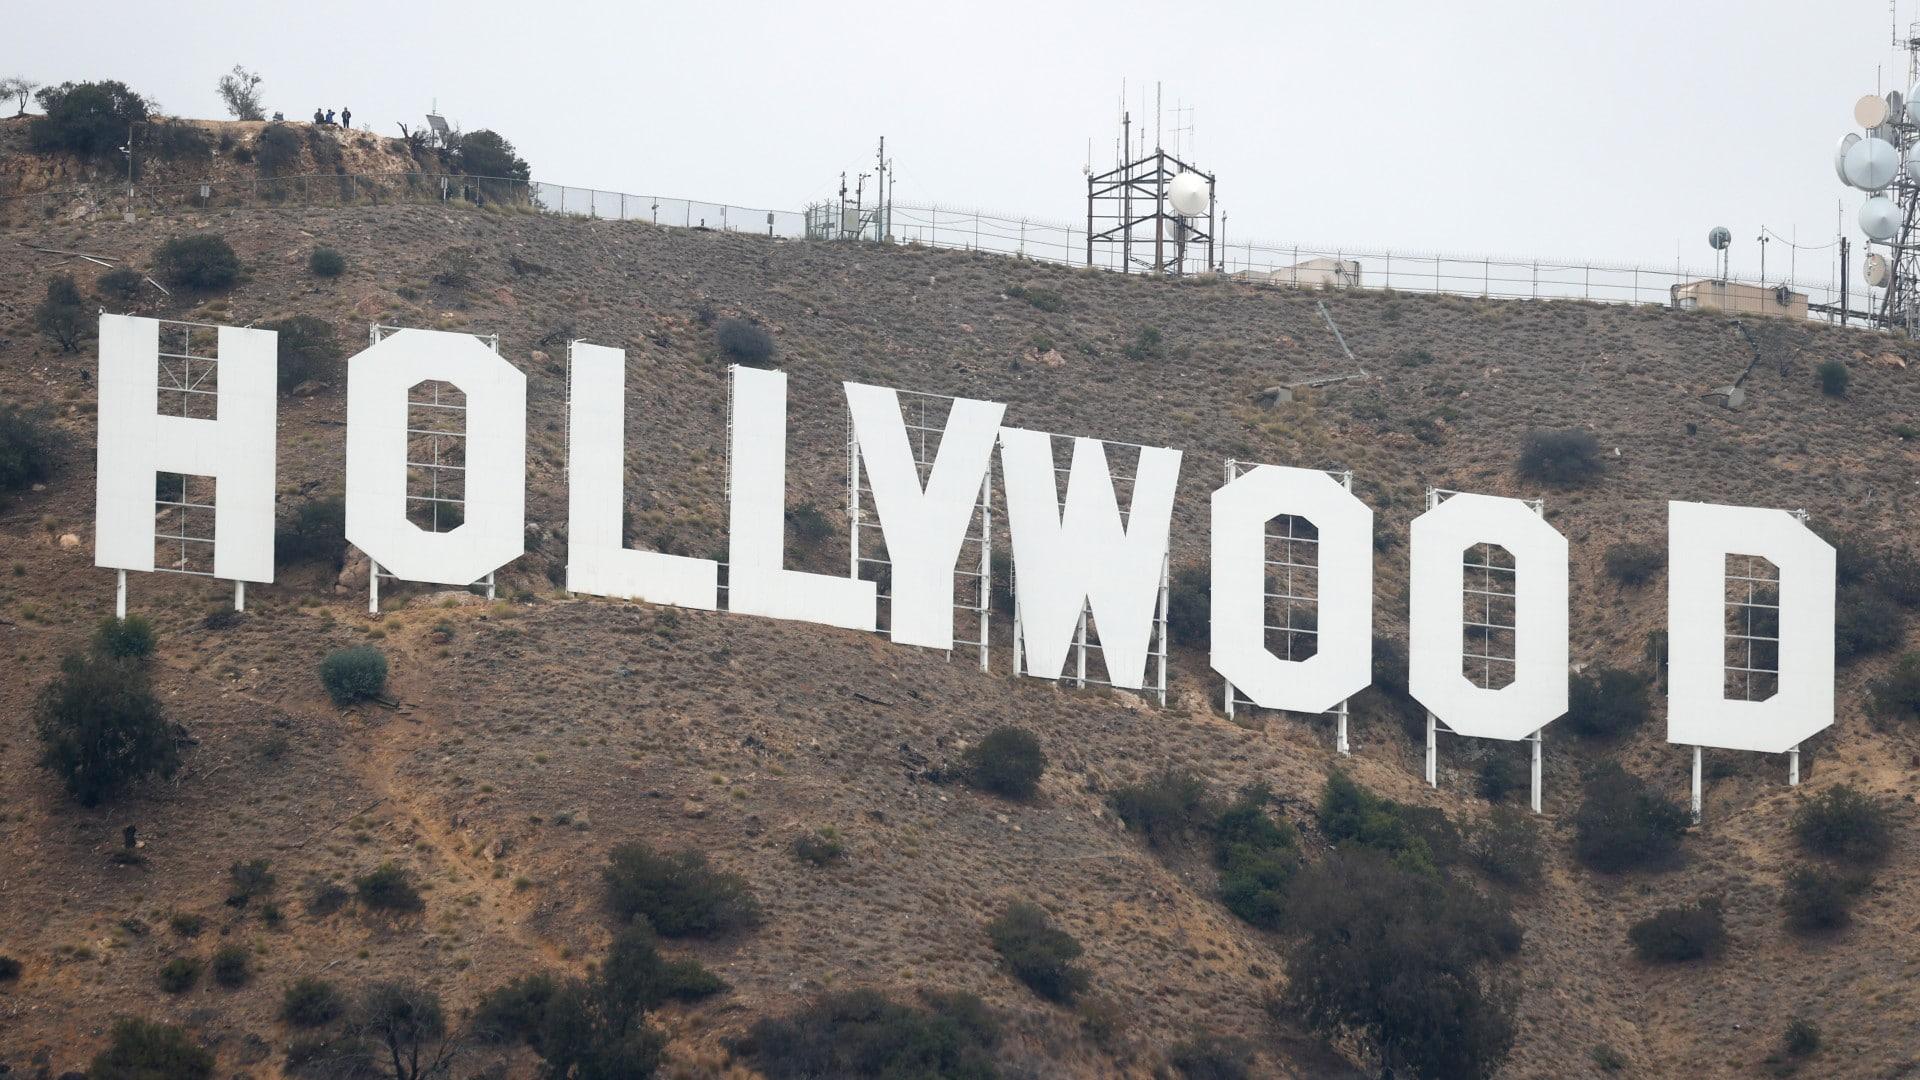 Trabajadores de Hollywood se irán a huelga a partir de la próxima semana